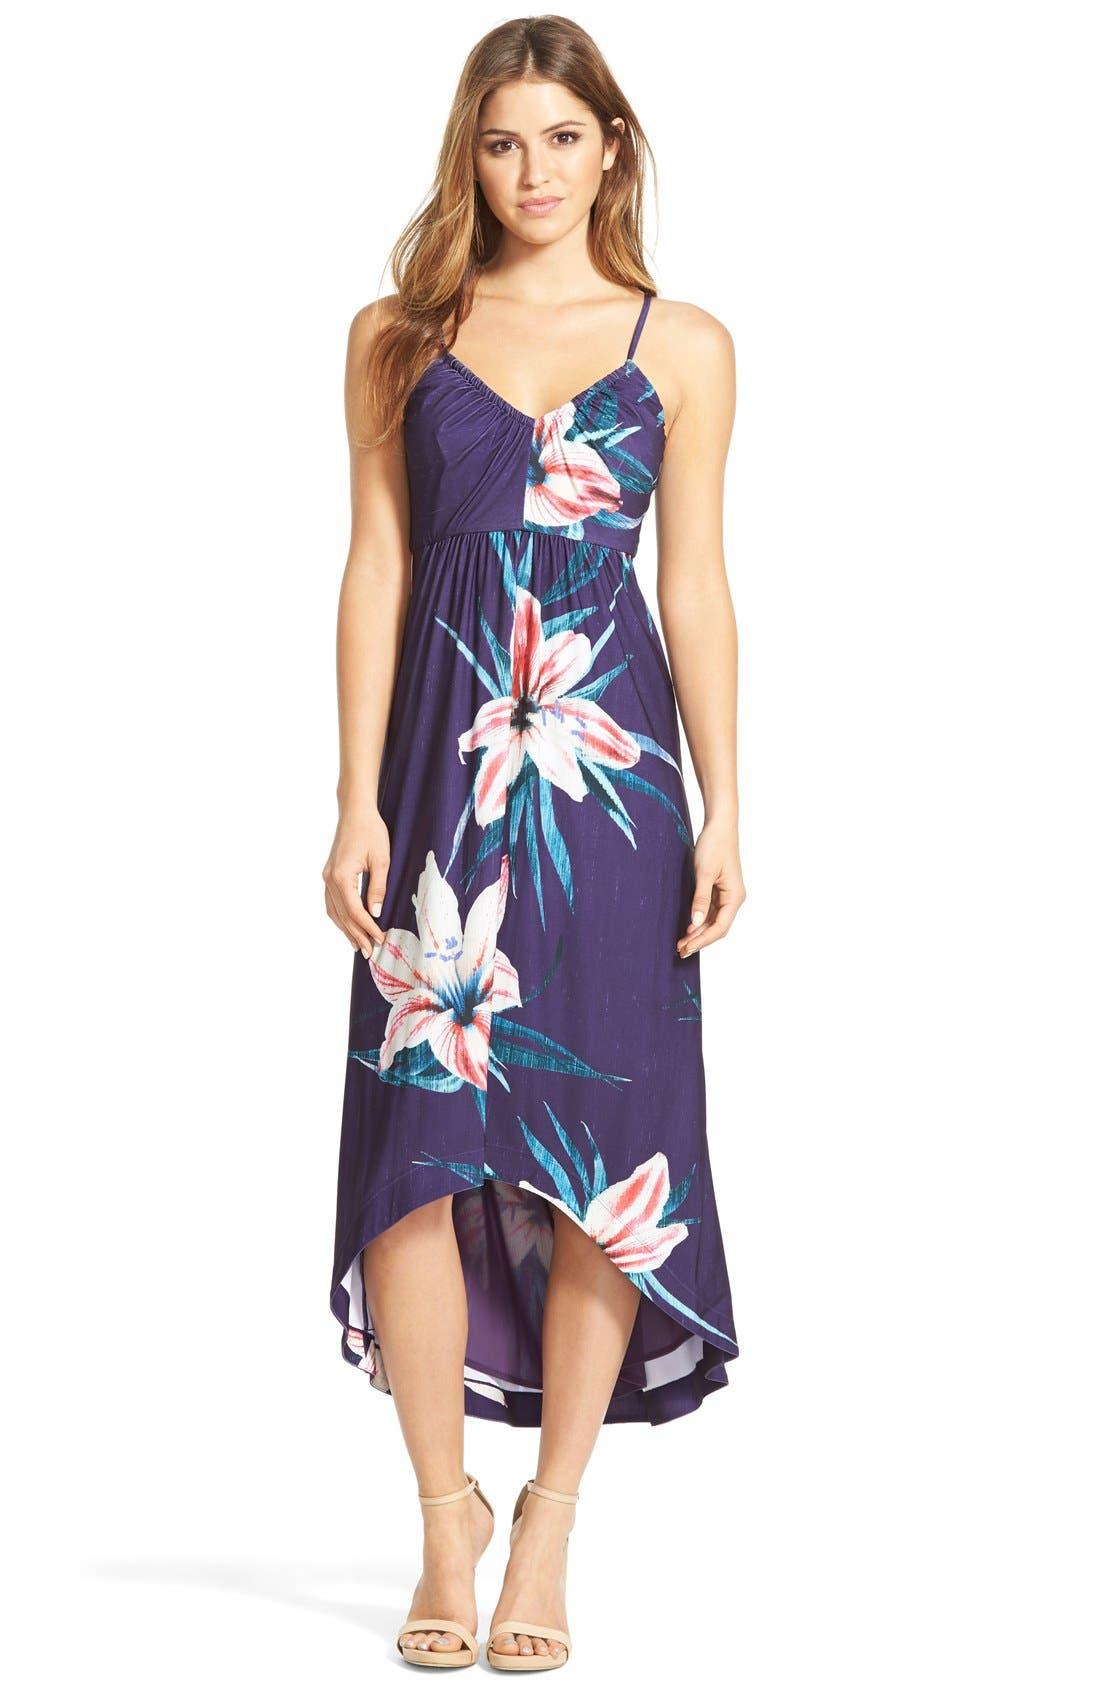 Alternate Image 1 Selected - Catherine Catherine Malandrino 'Sheila' Floral Print V-Neck Sundress